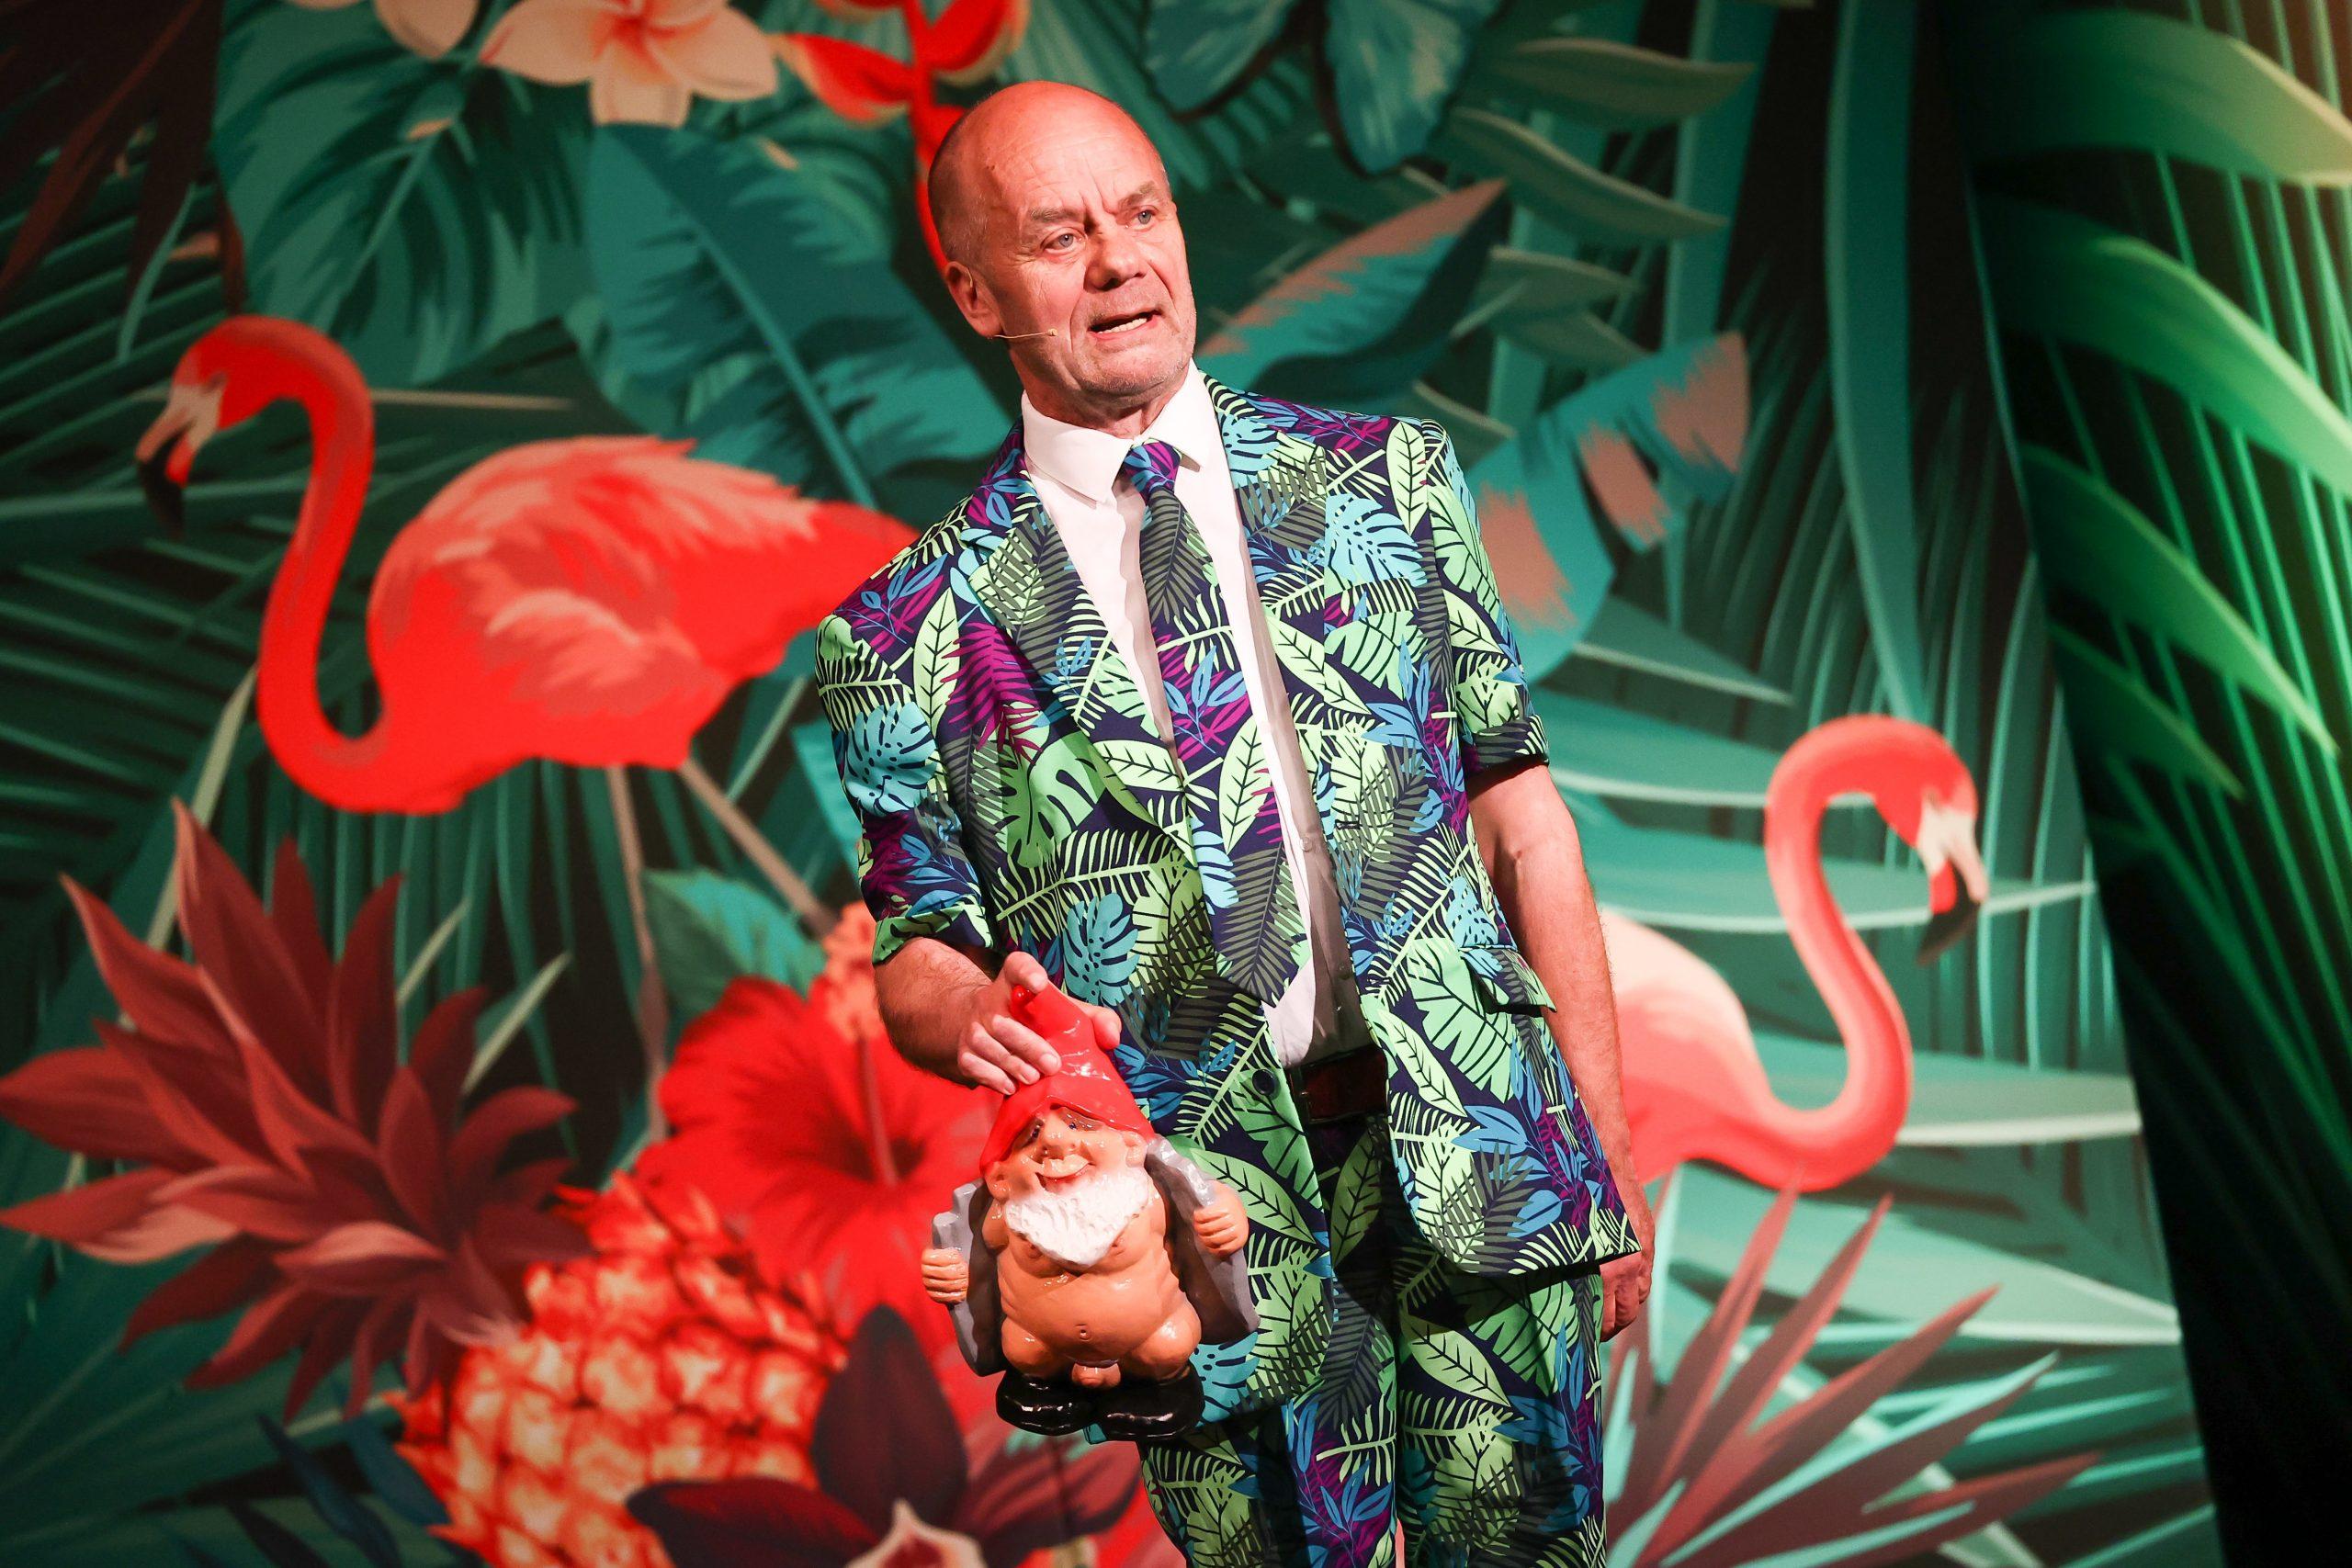 Theaterchef Corny Littmann in Hamburg